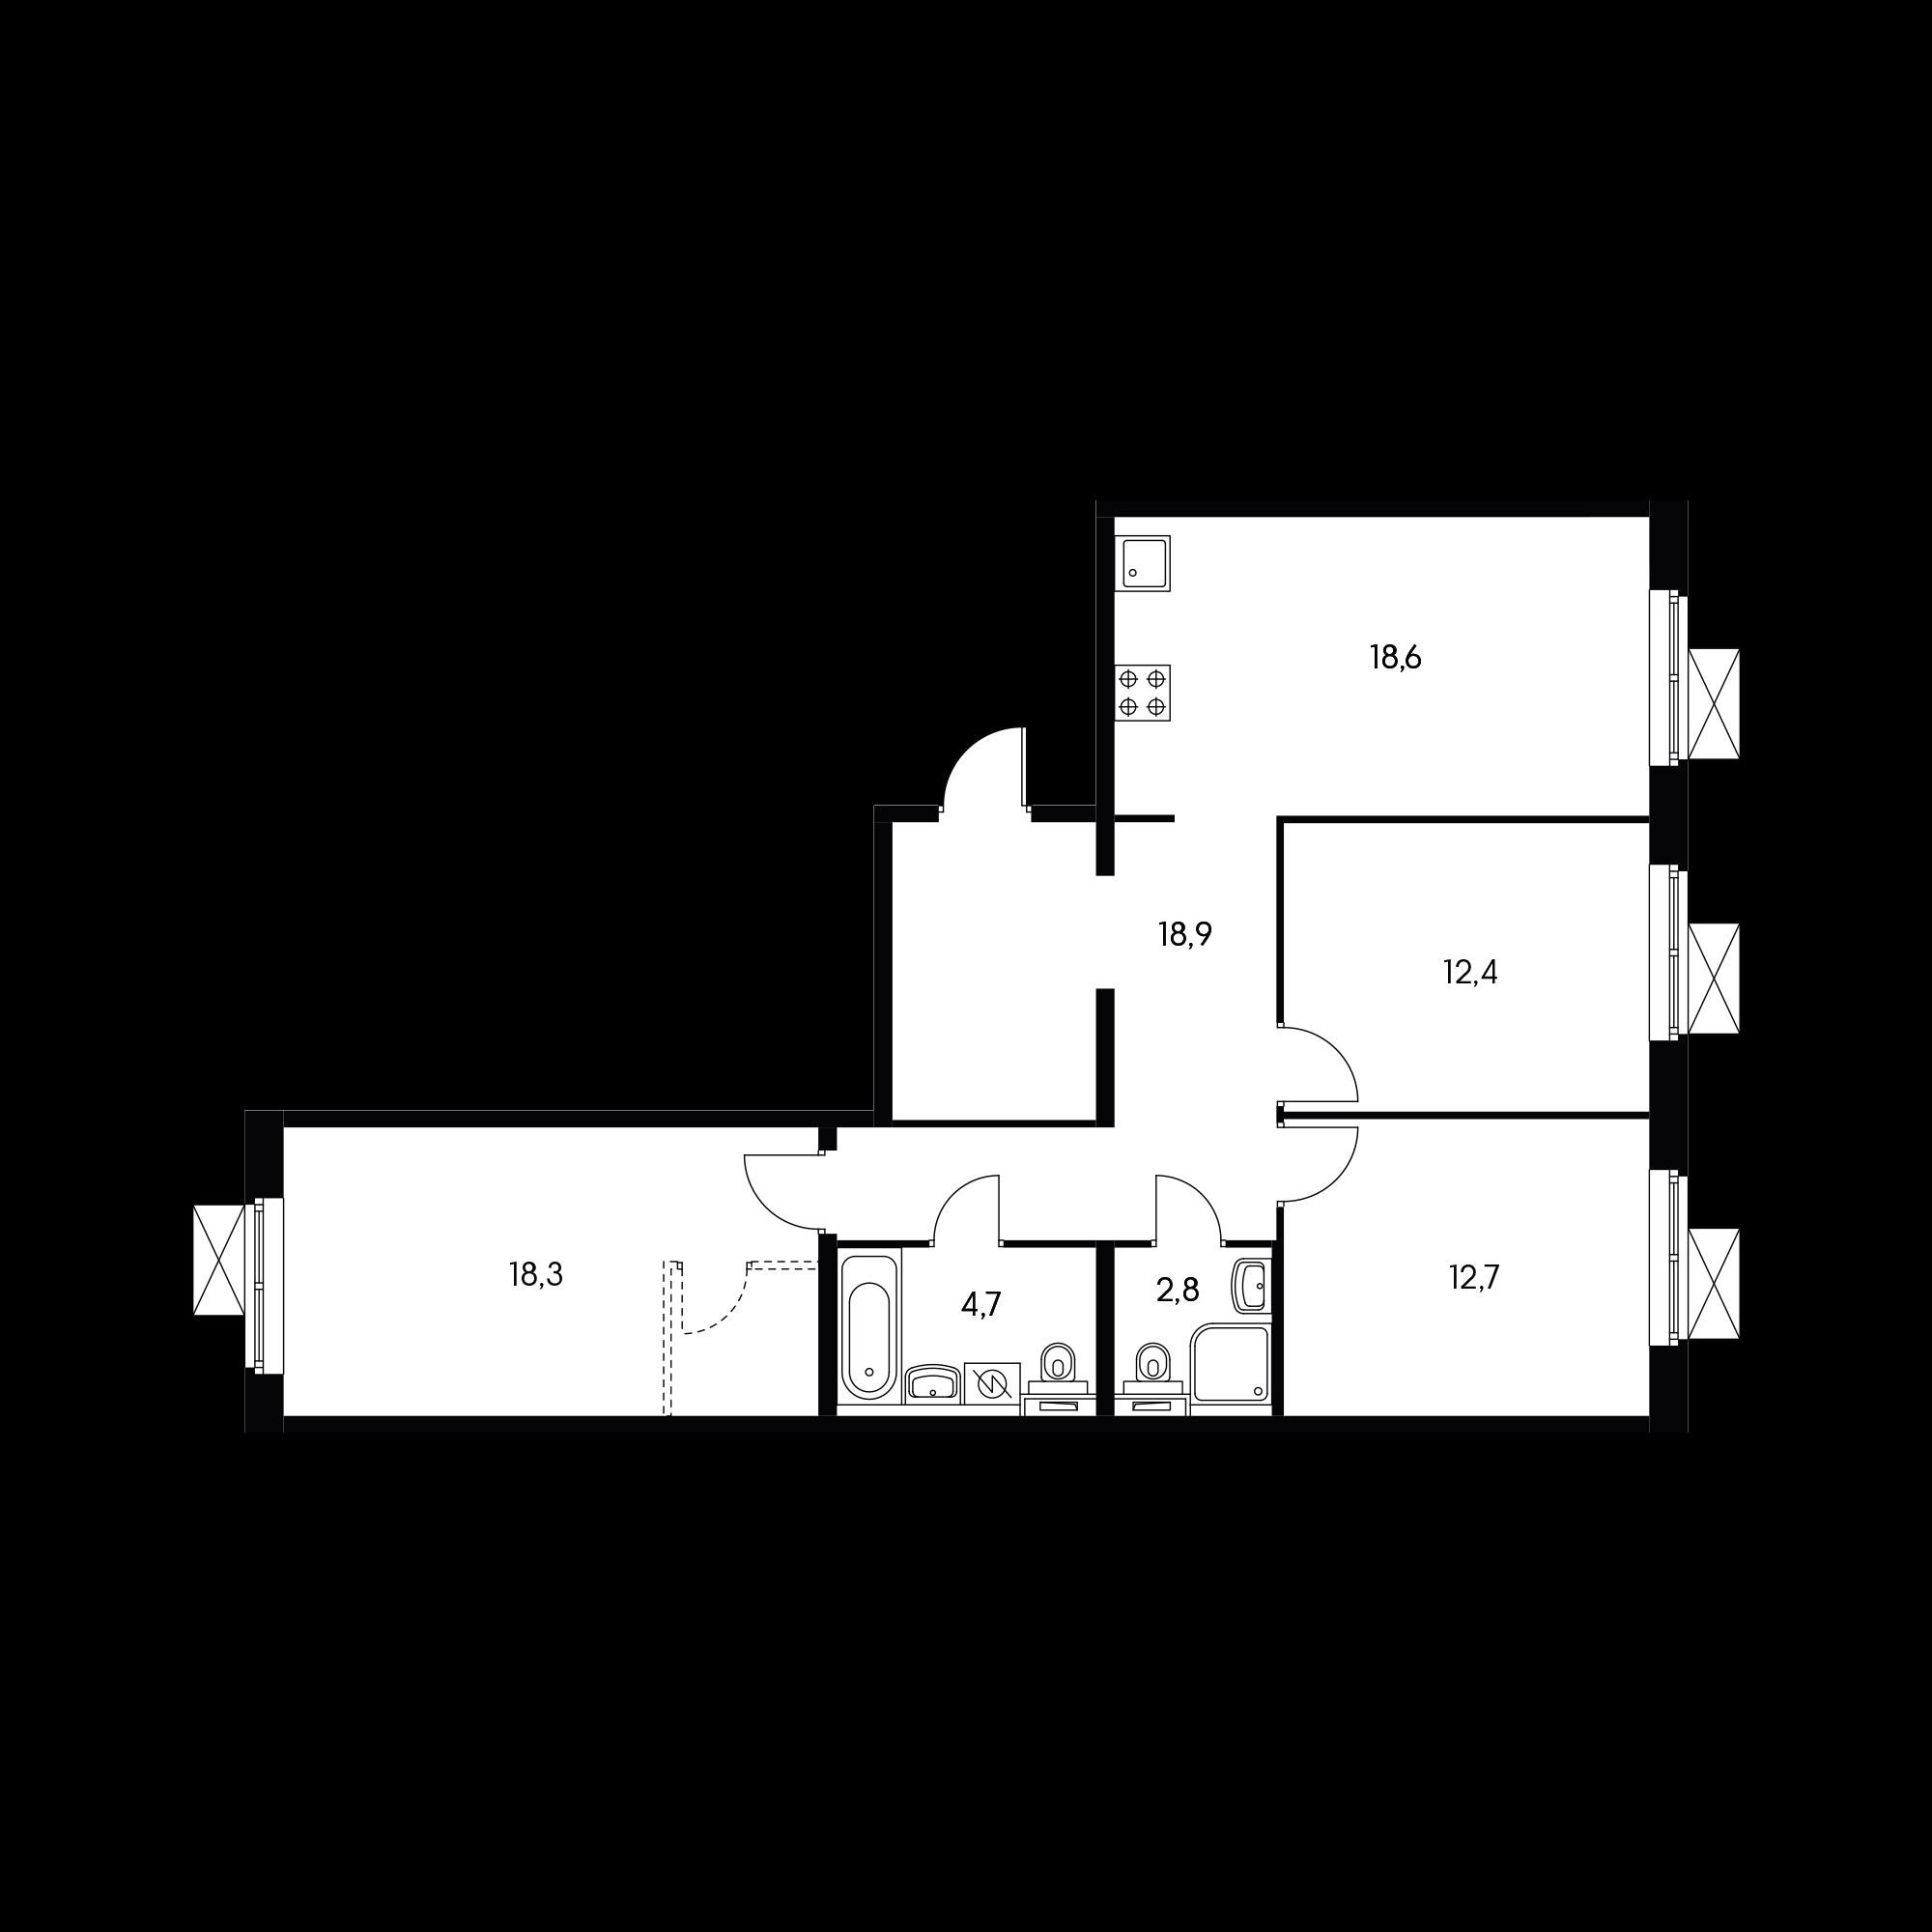 3EL3_9.9-1*